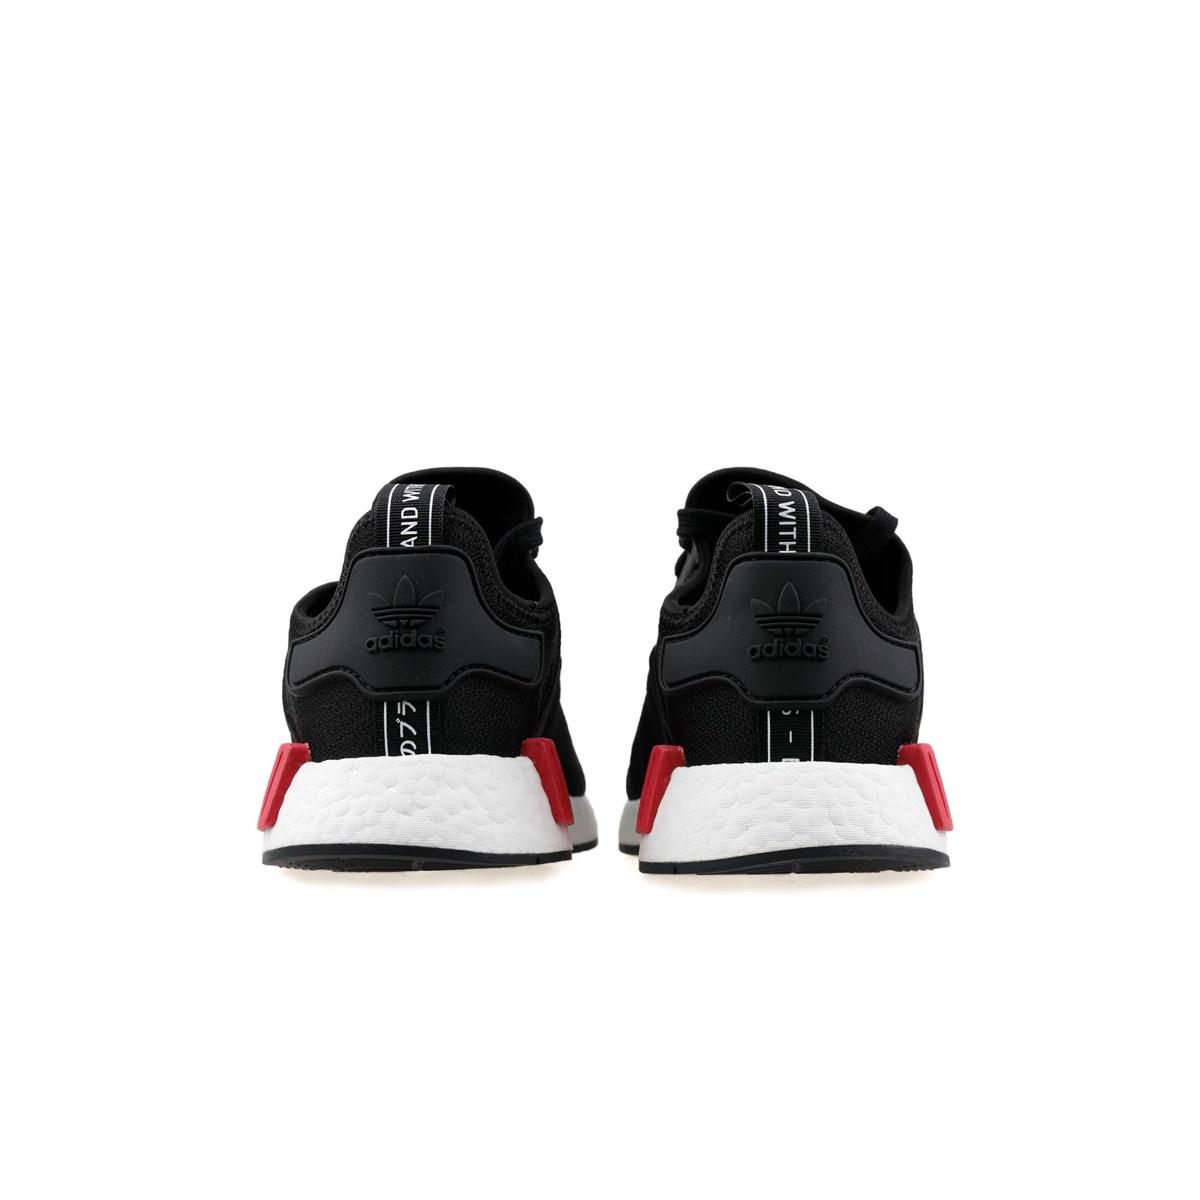 adidas NMD_R1 Kadın Siyah Spor Ayakkabı (EE5100)